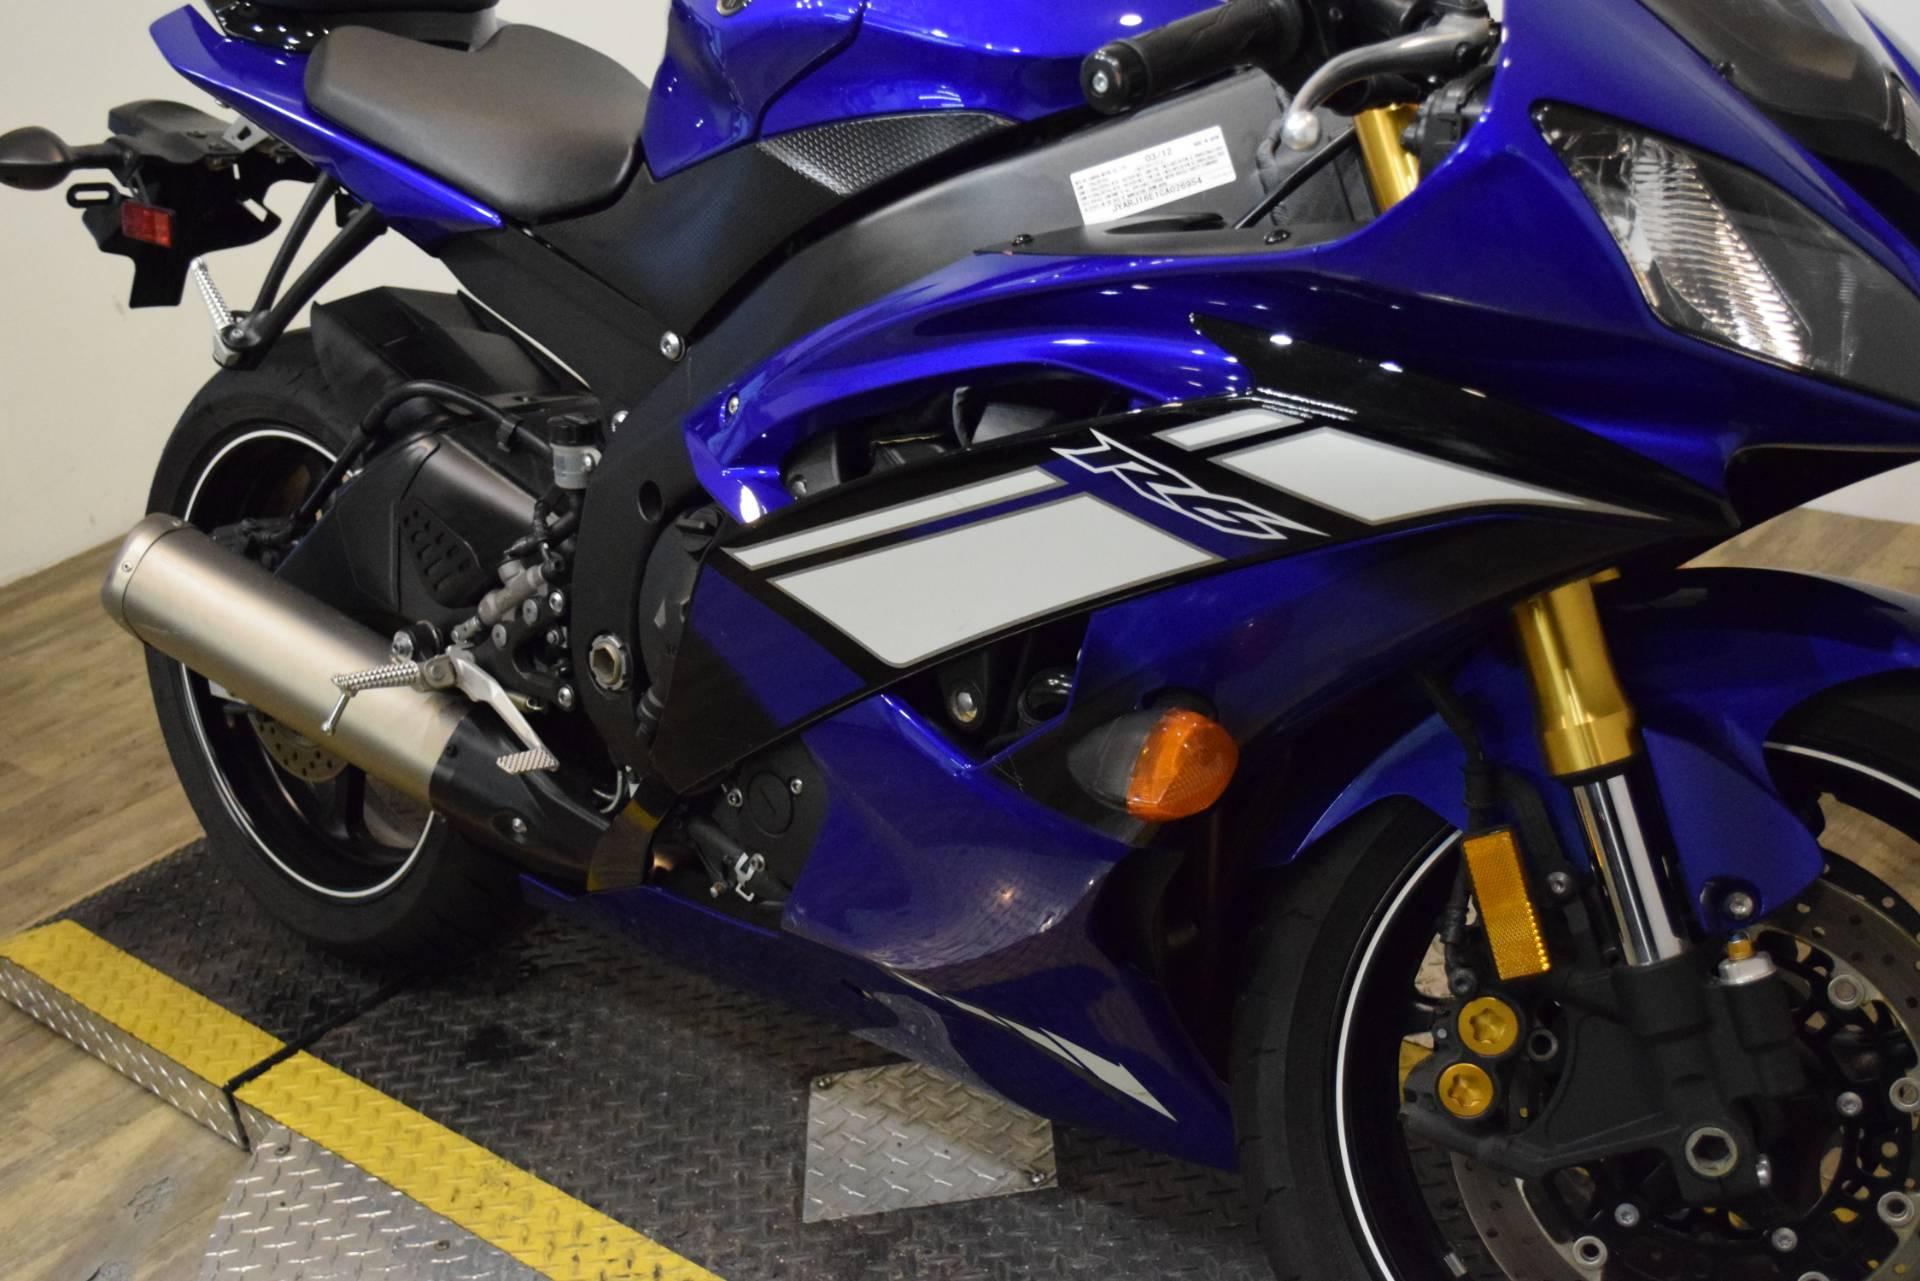 2012 Yamaha YZF R6 4